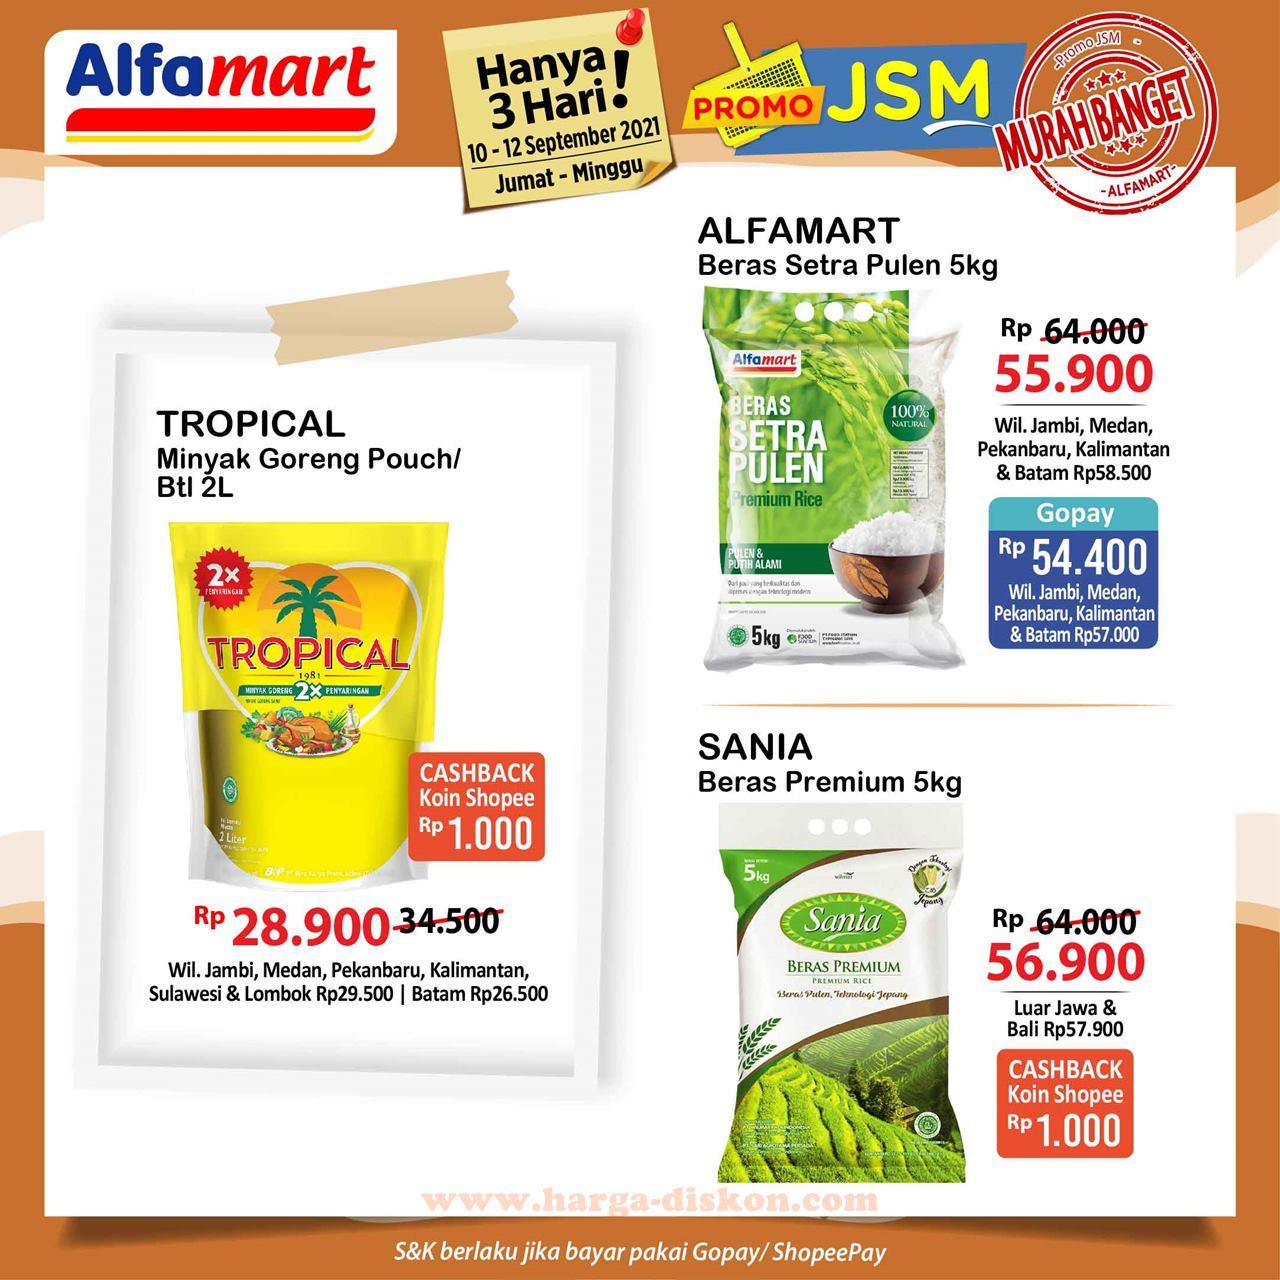 Promo ALFAMART Akhir Pekan Weekend Promo JSM 10 - 12 September 2021